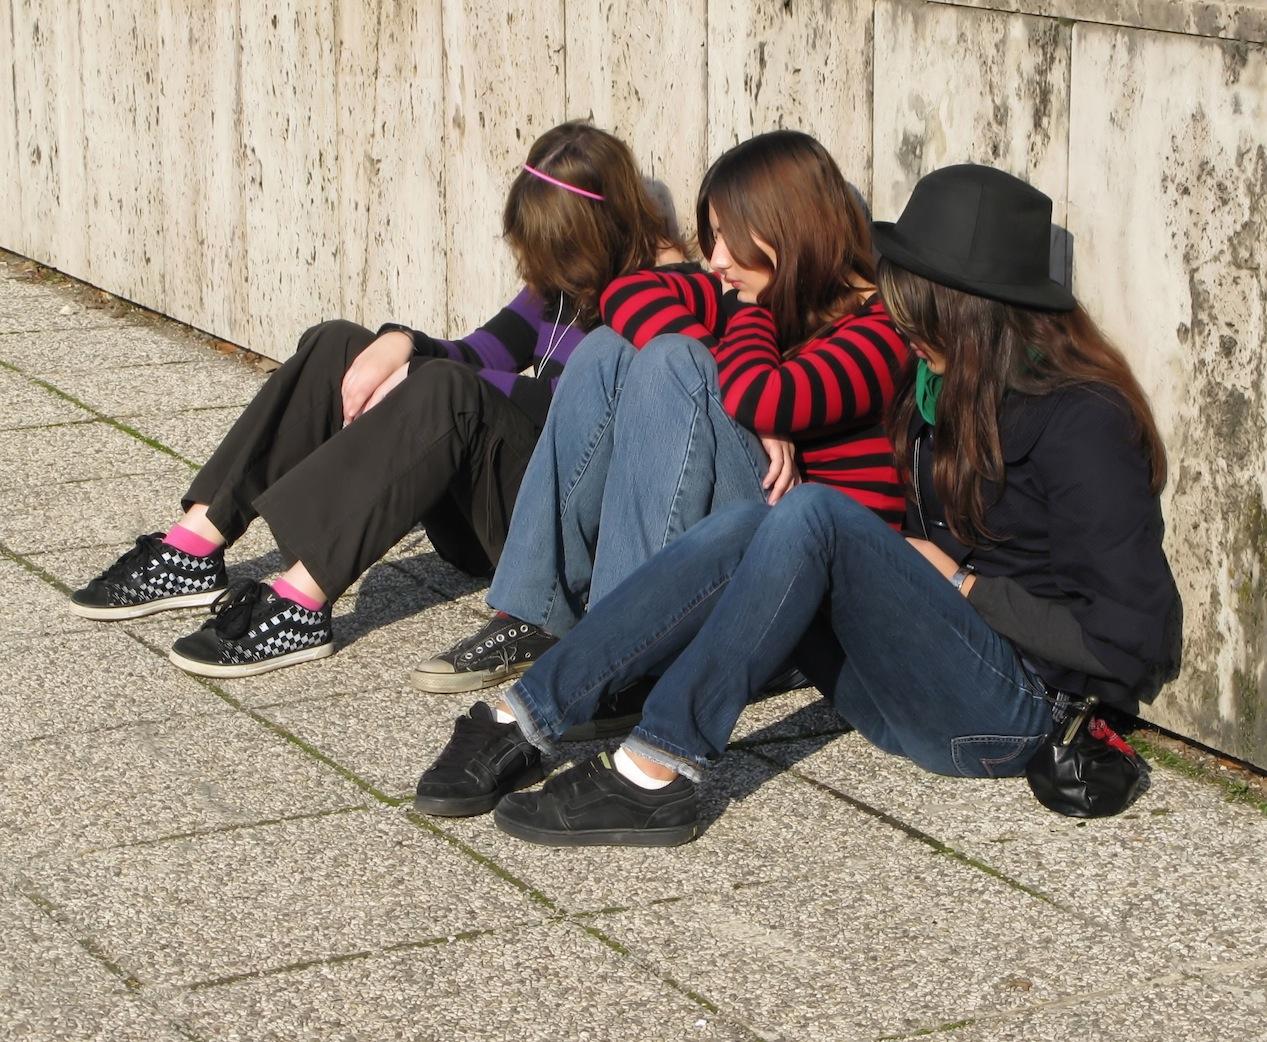 Residential treatment teens redding california